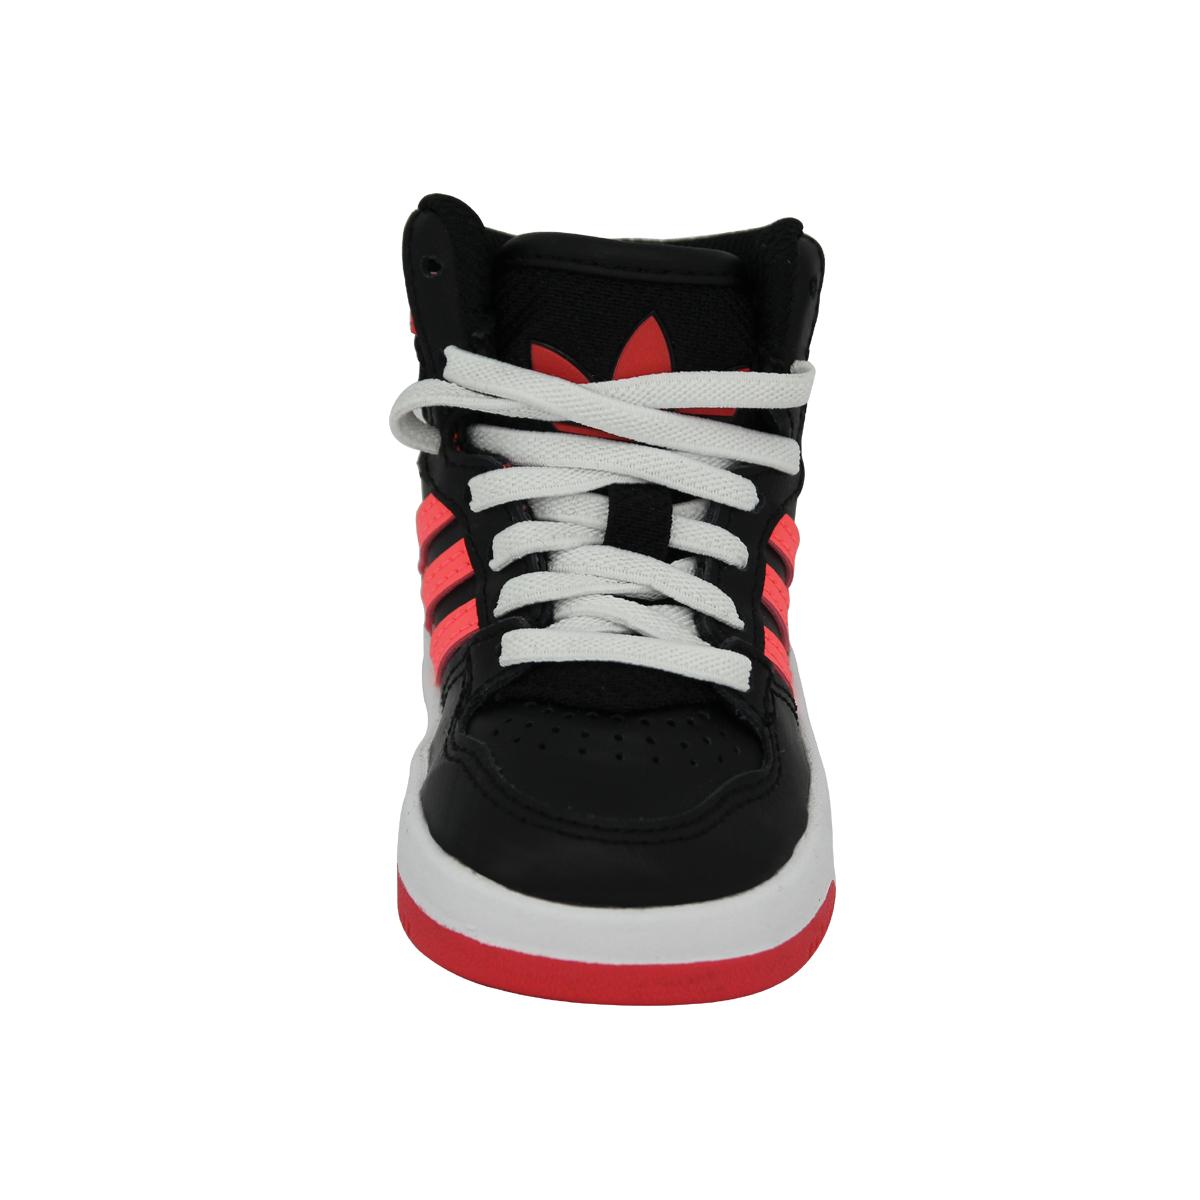 Attitude Chaussures Sneakers Adidas Court Mode Ei Originals Enfant qZxfSawF